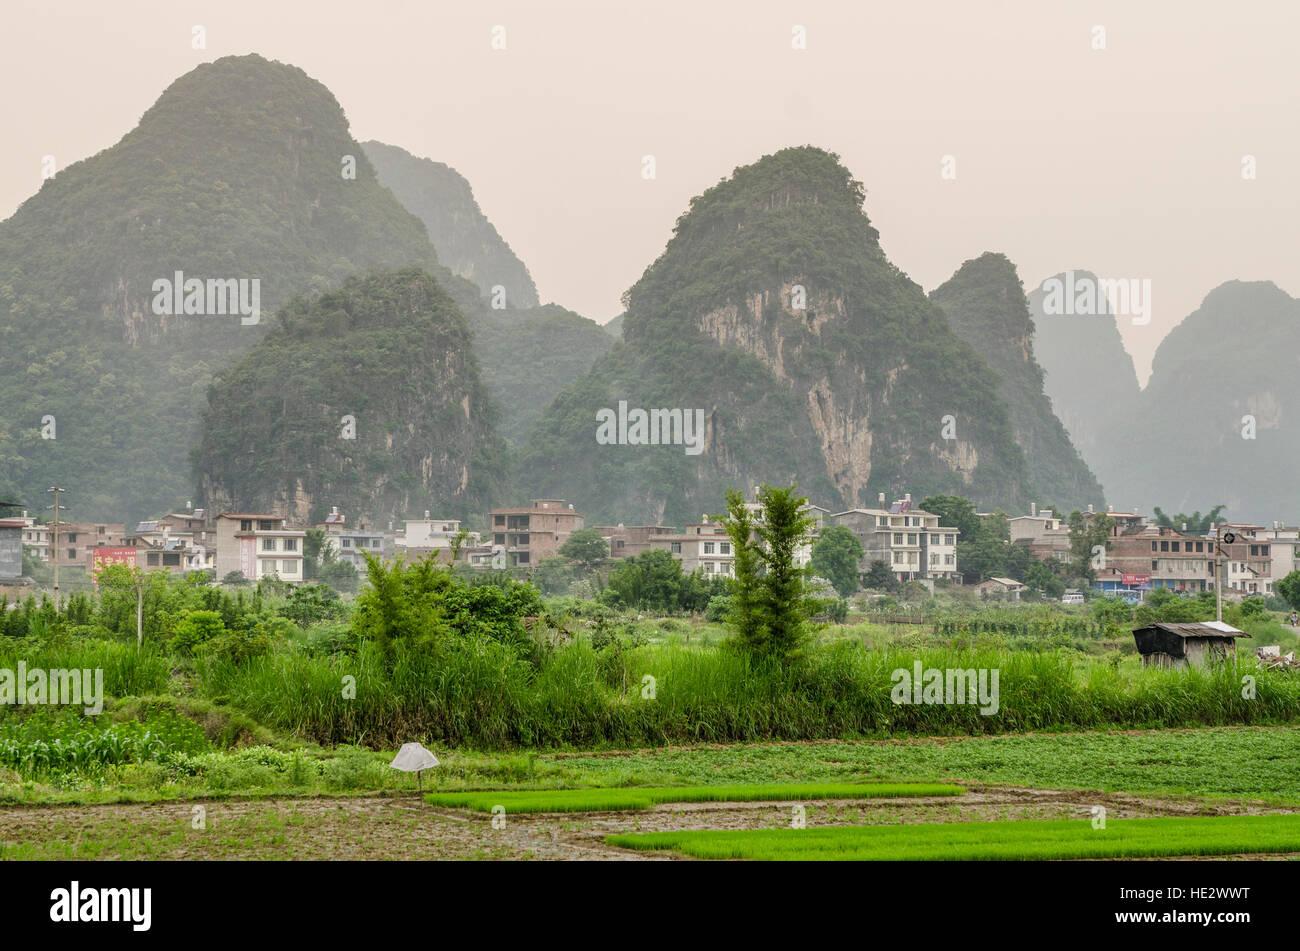 Karst Topography Landscape Formations Mountains Hills